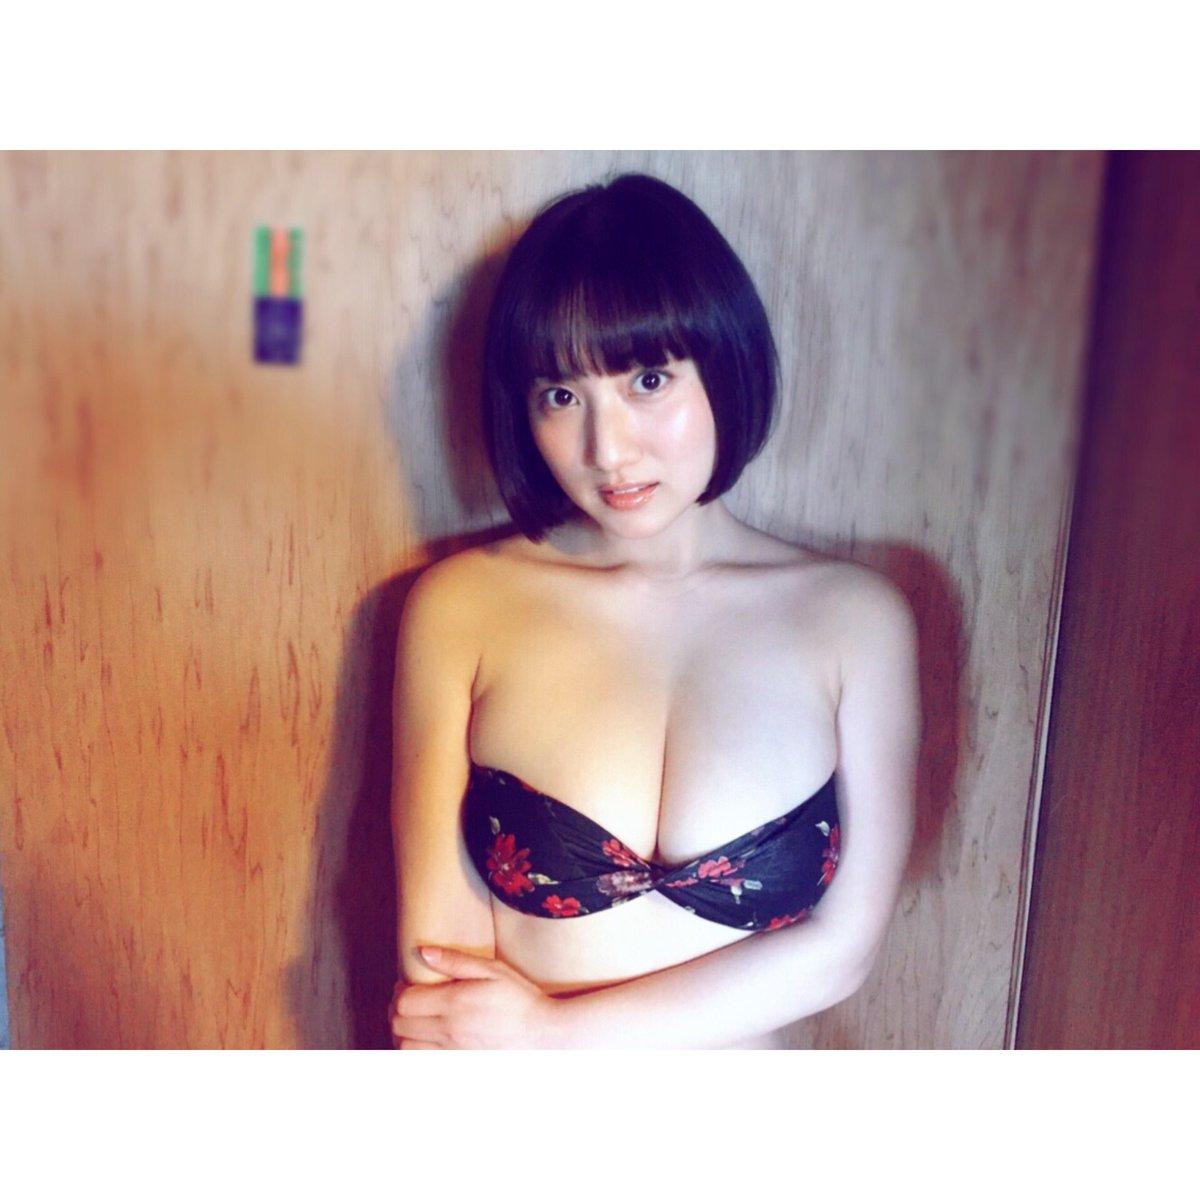 紗綾 part100★ [無断転載禁止]©bbspink.comYouTube動画>4本 ->画像>684枚